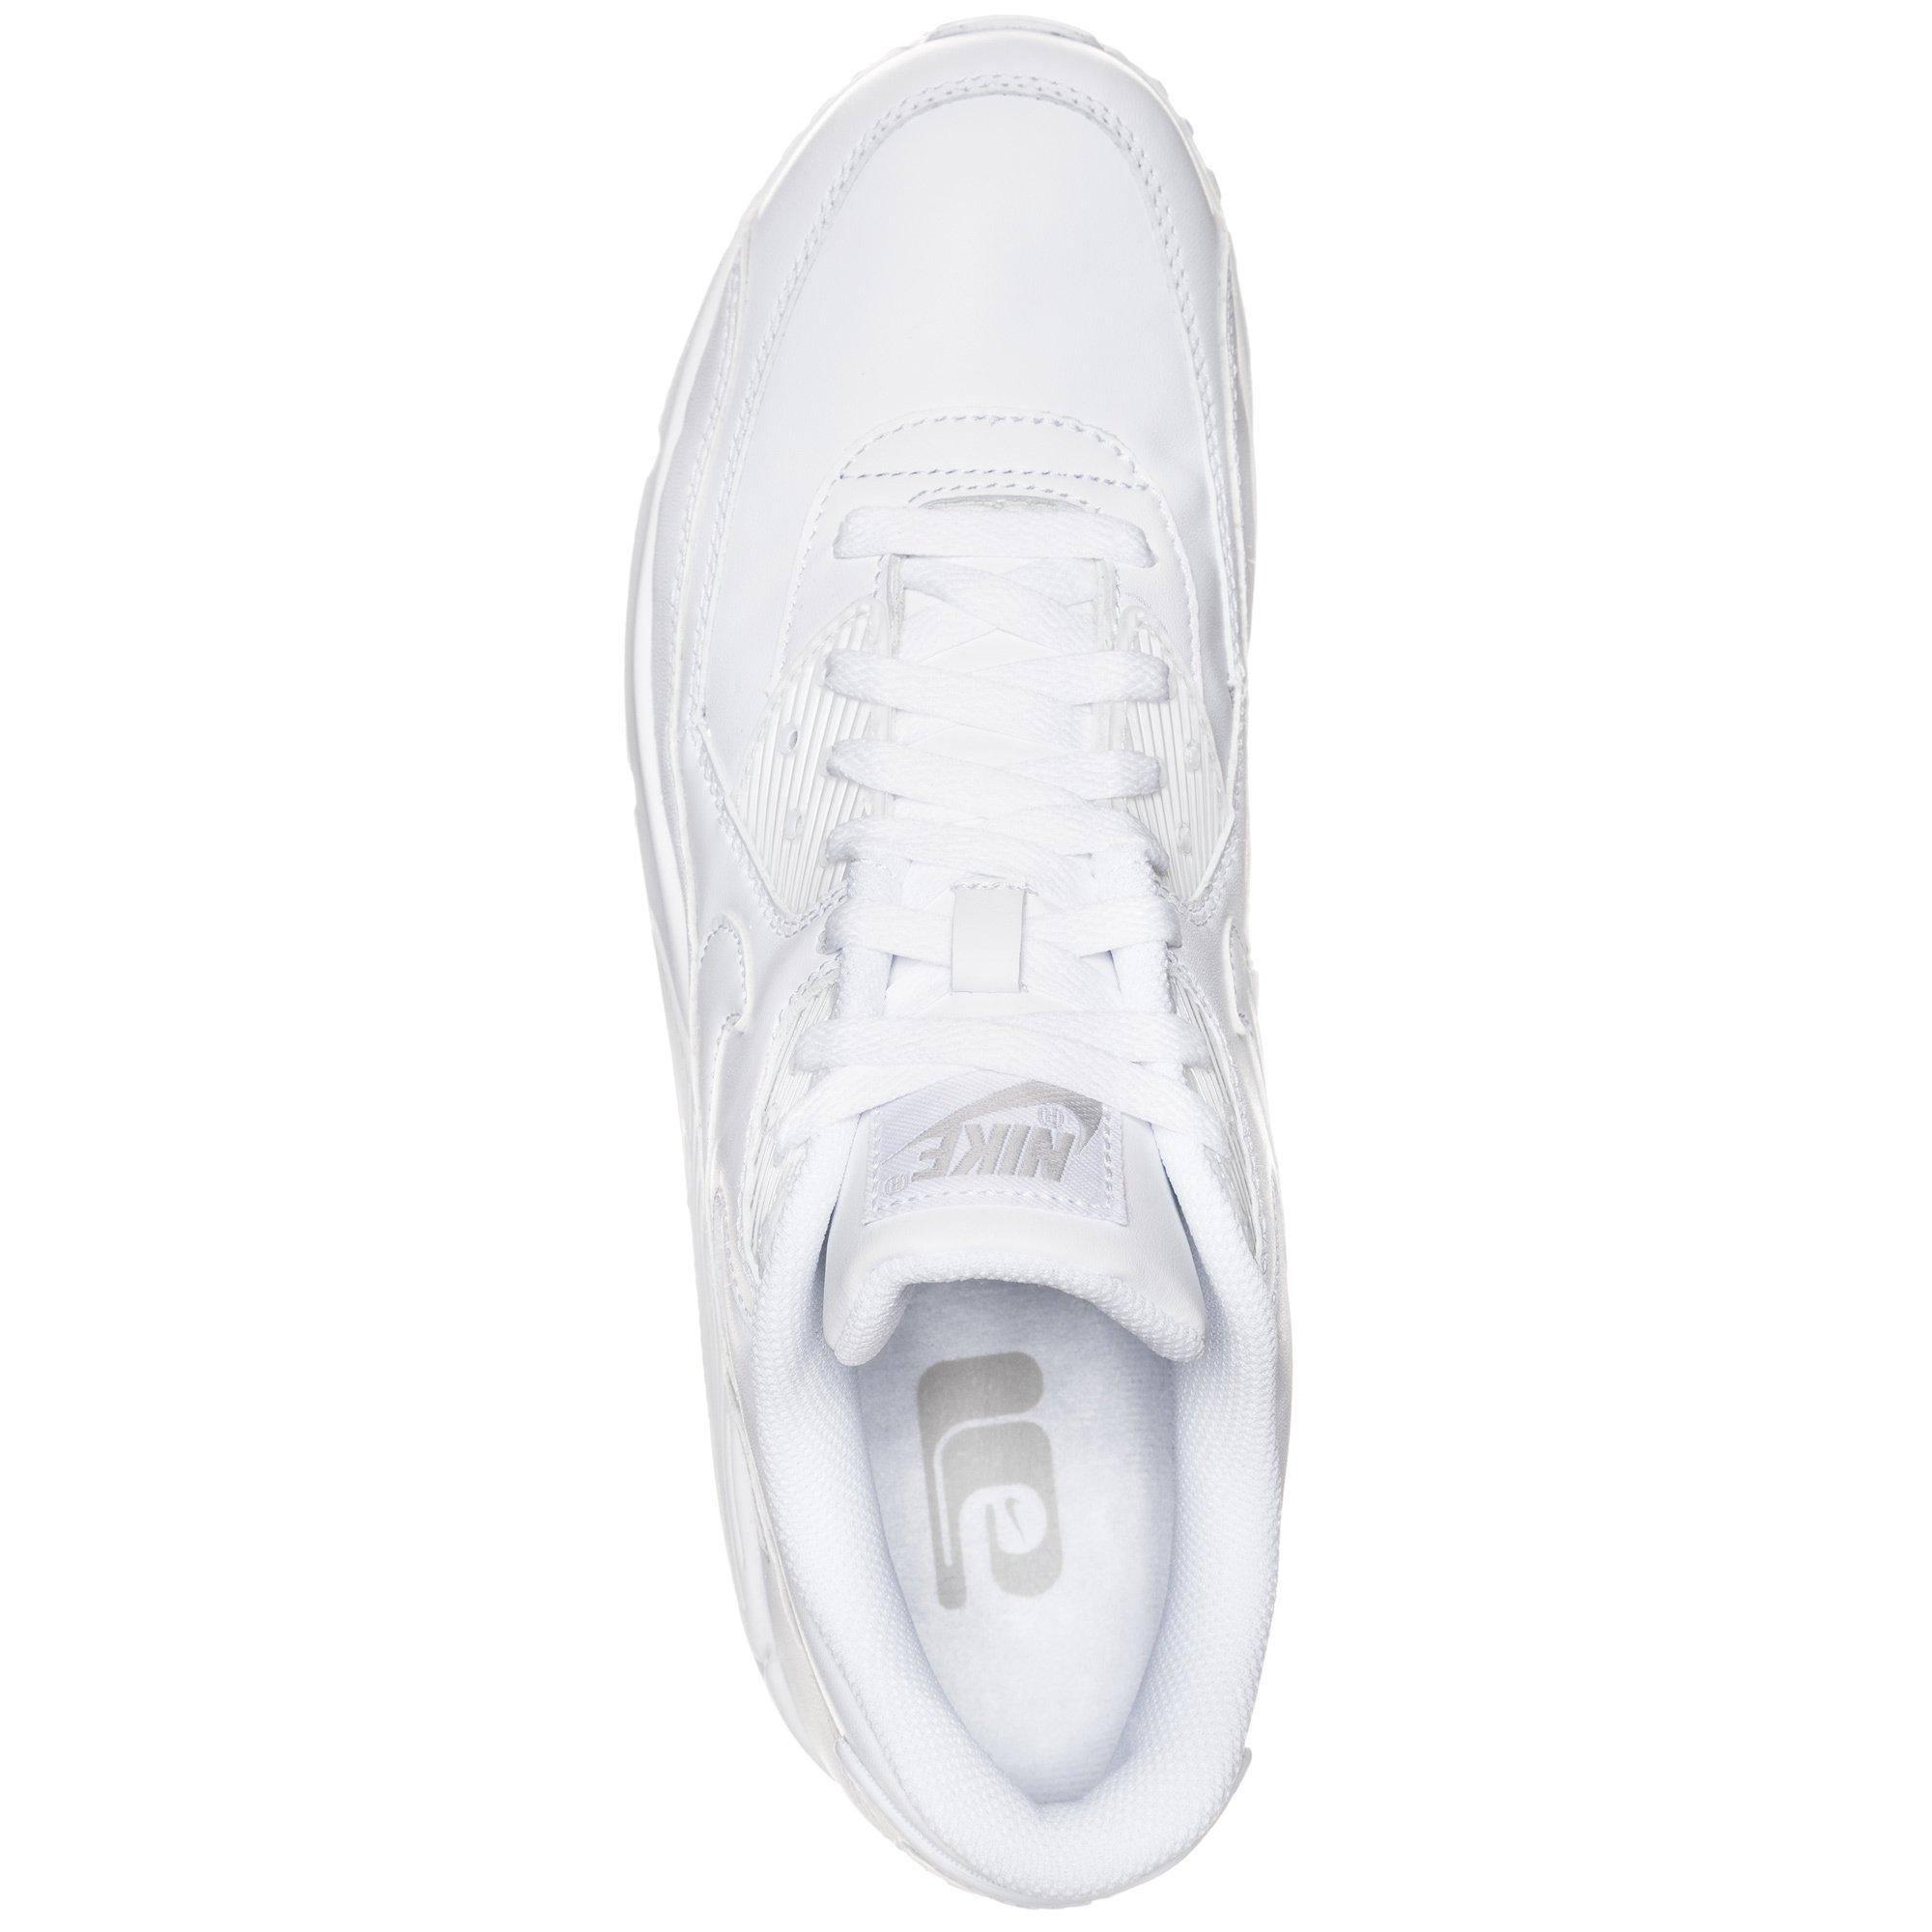 BiancobiancoBianco Air Max Uomo Sneaker Pelle In Nike 90 nv80Nmw